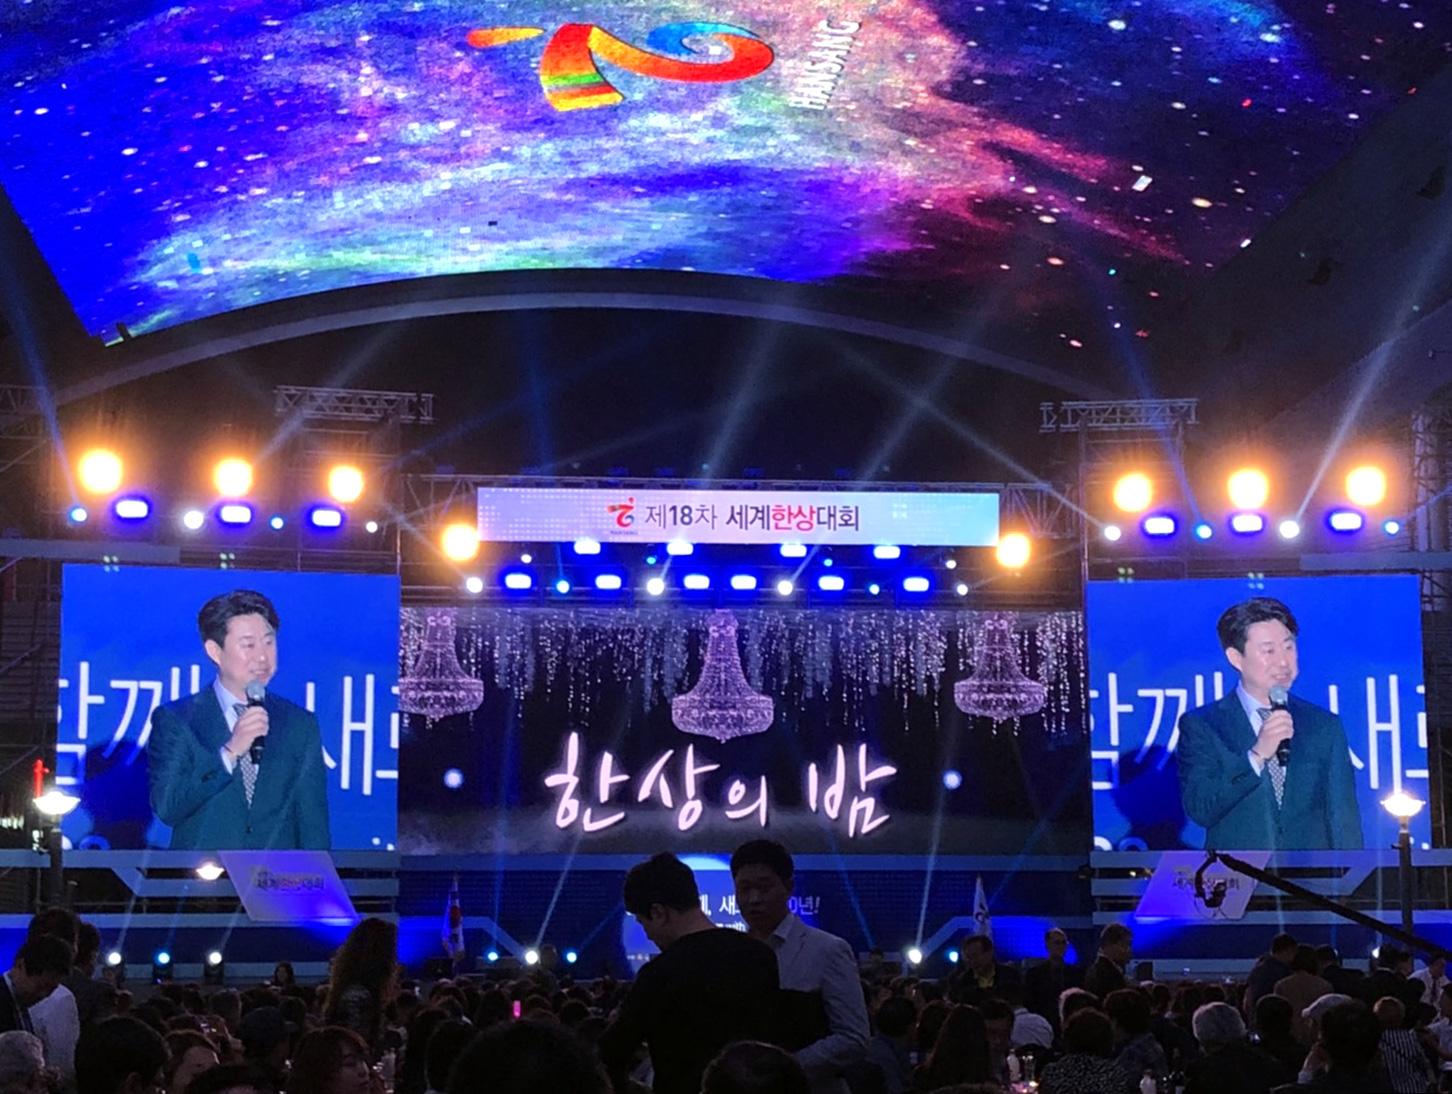 20191025_WorldKoreanBusinessConvention_001